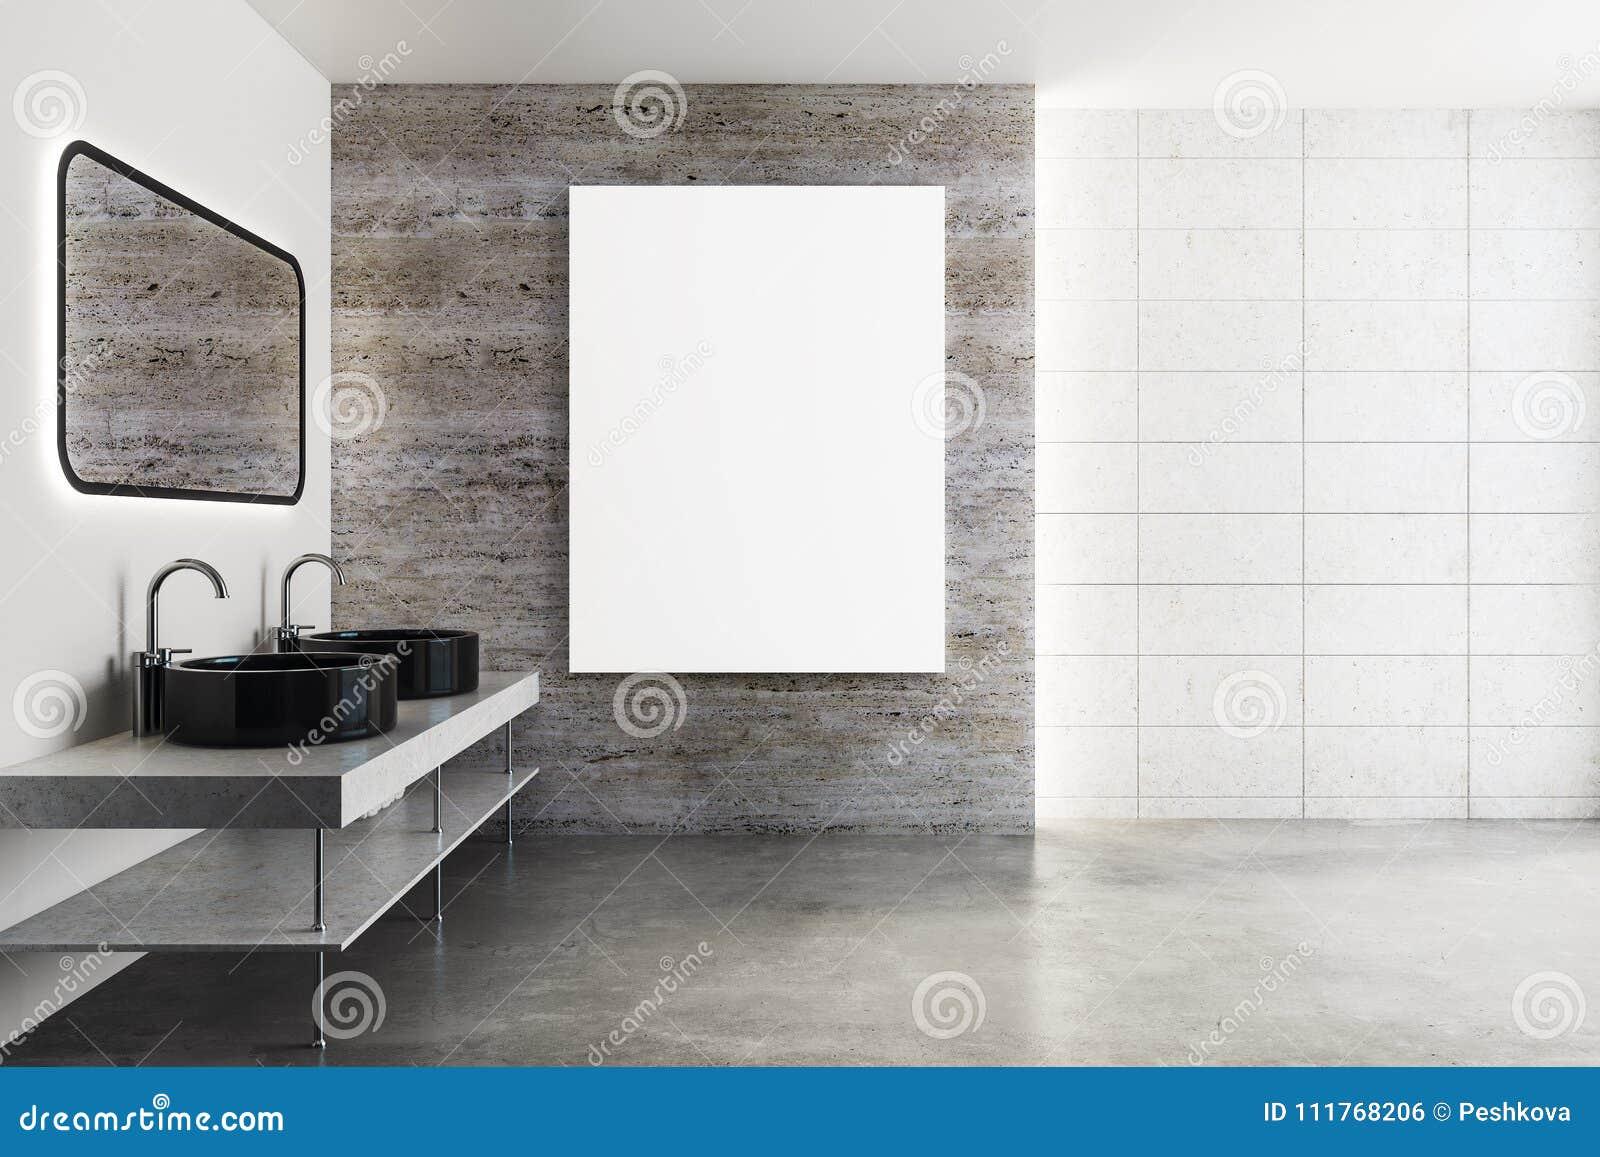 Bathroom Mirror Reflection. Modern Bathroom With Poster Mirror ...